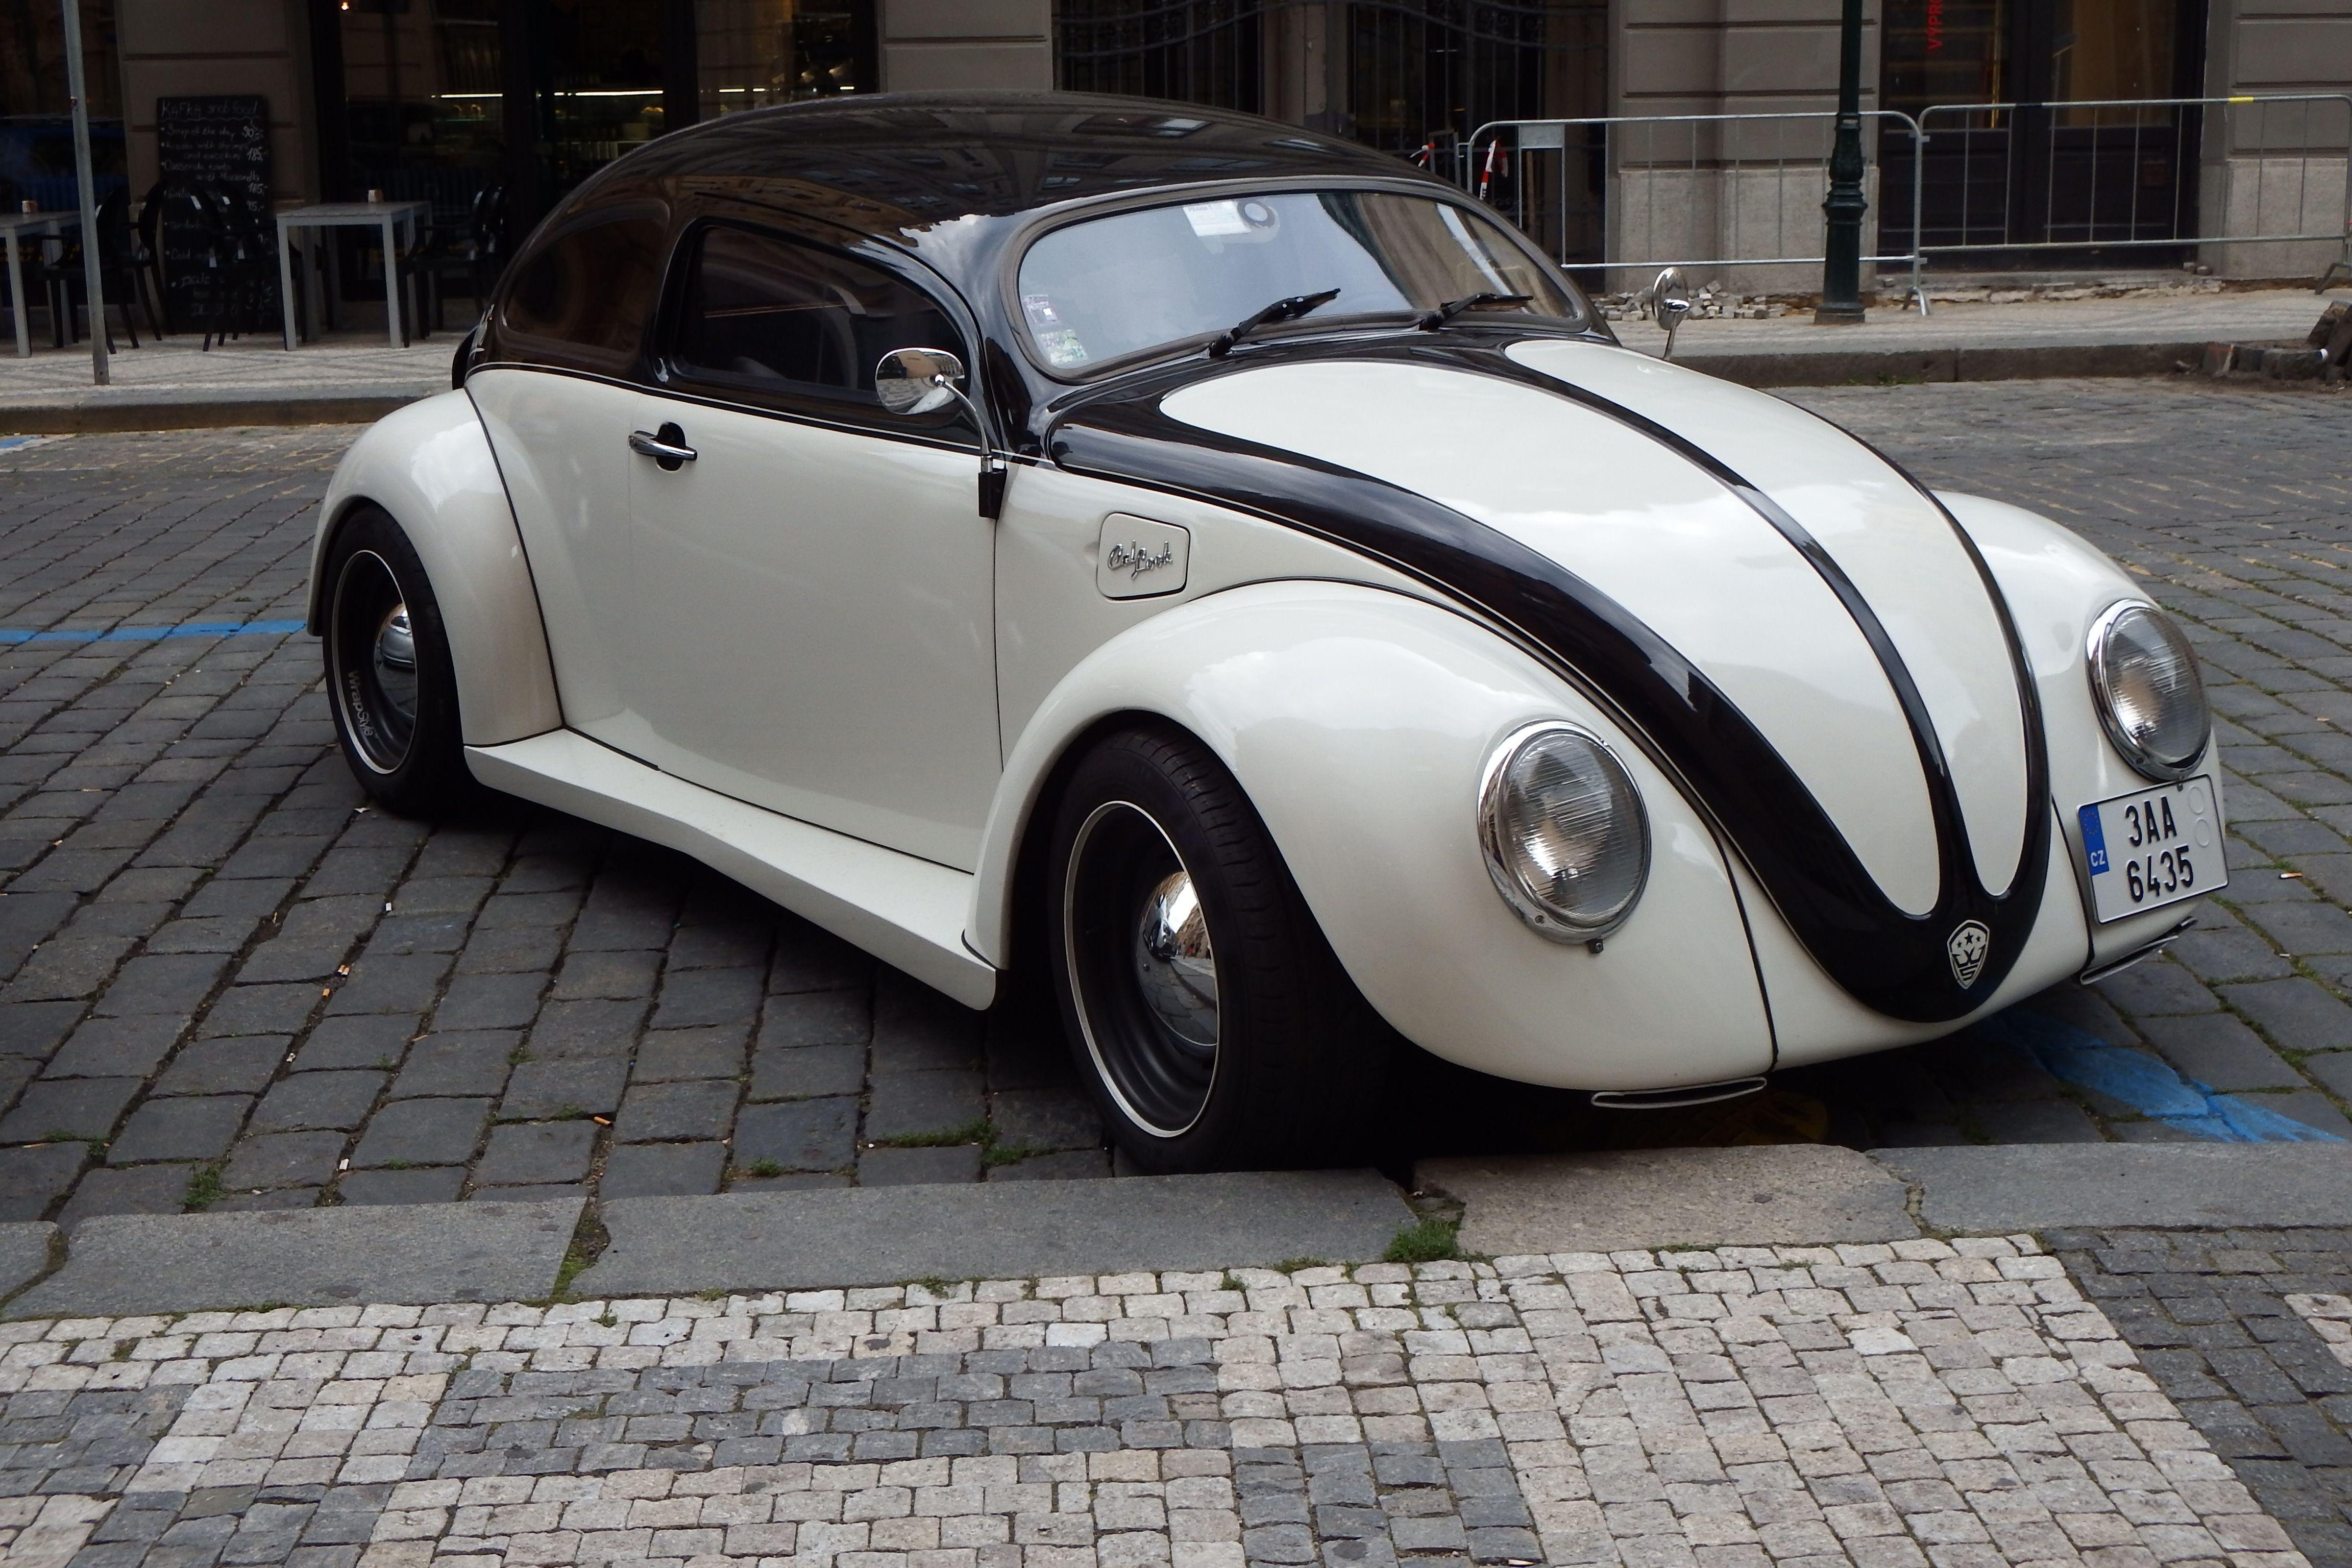 tuned volkswagen beetle vw custom cars vw cars. Black Bedroom Furniture Sets. Home Design Ideas